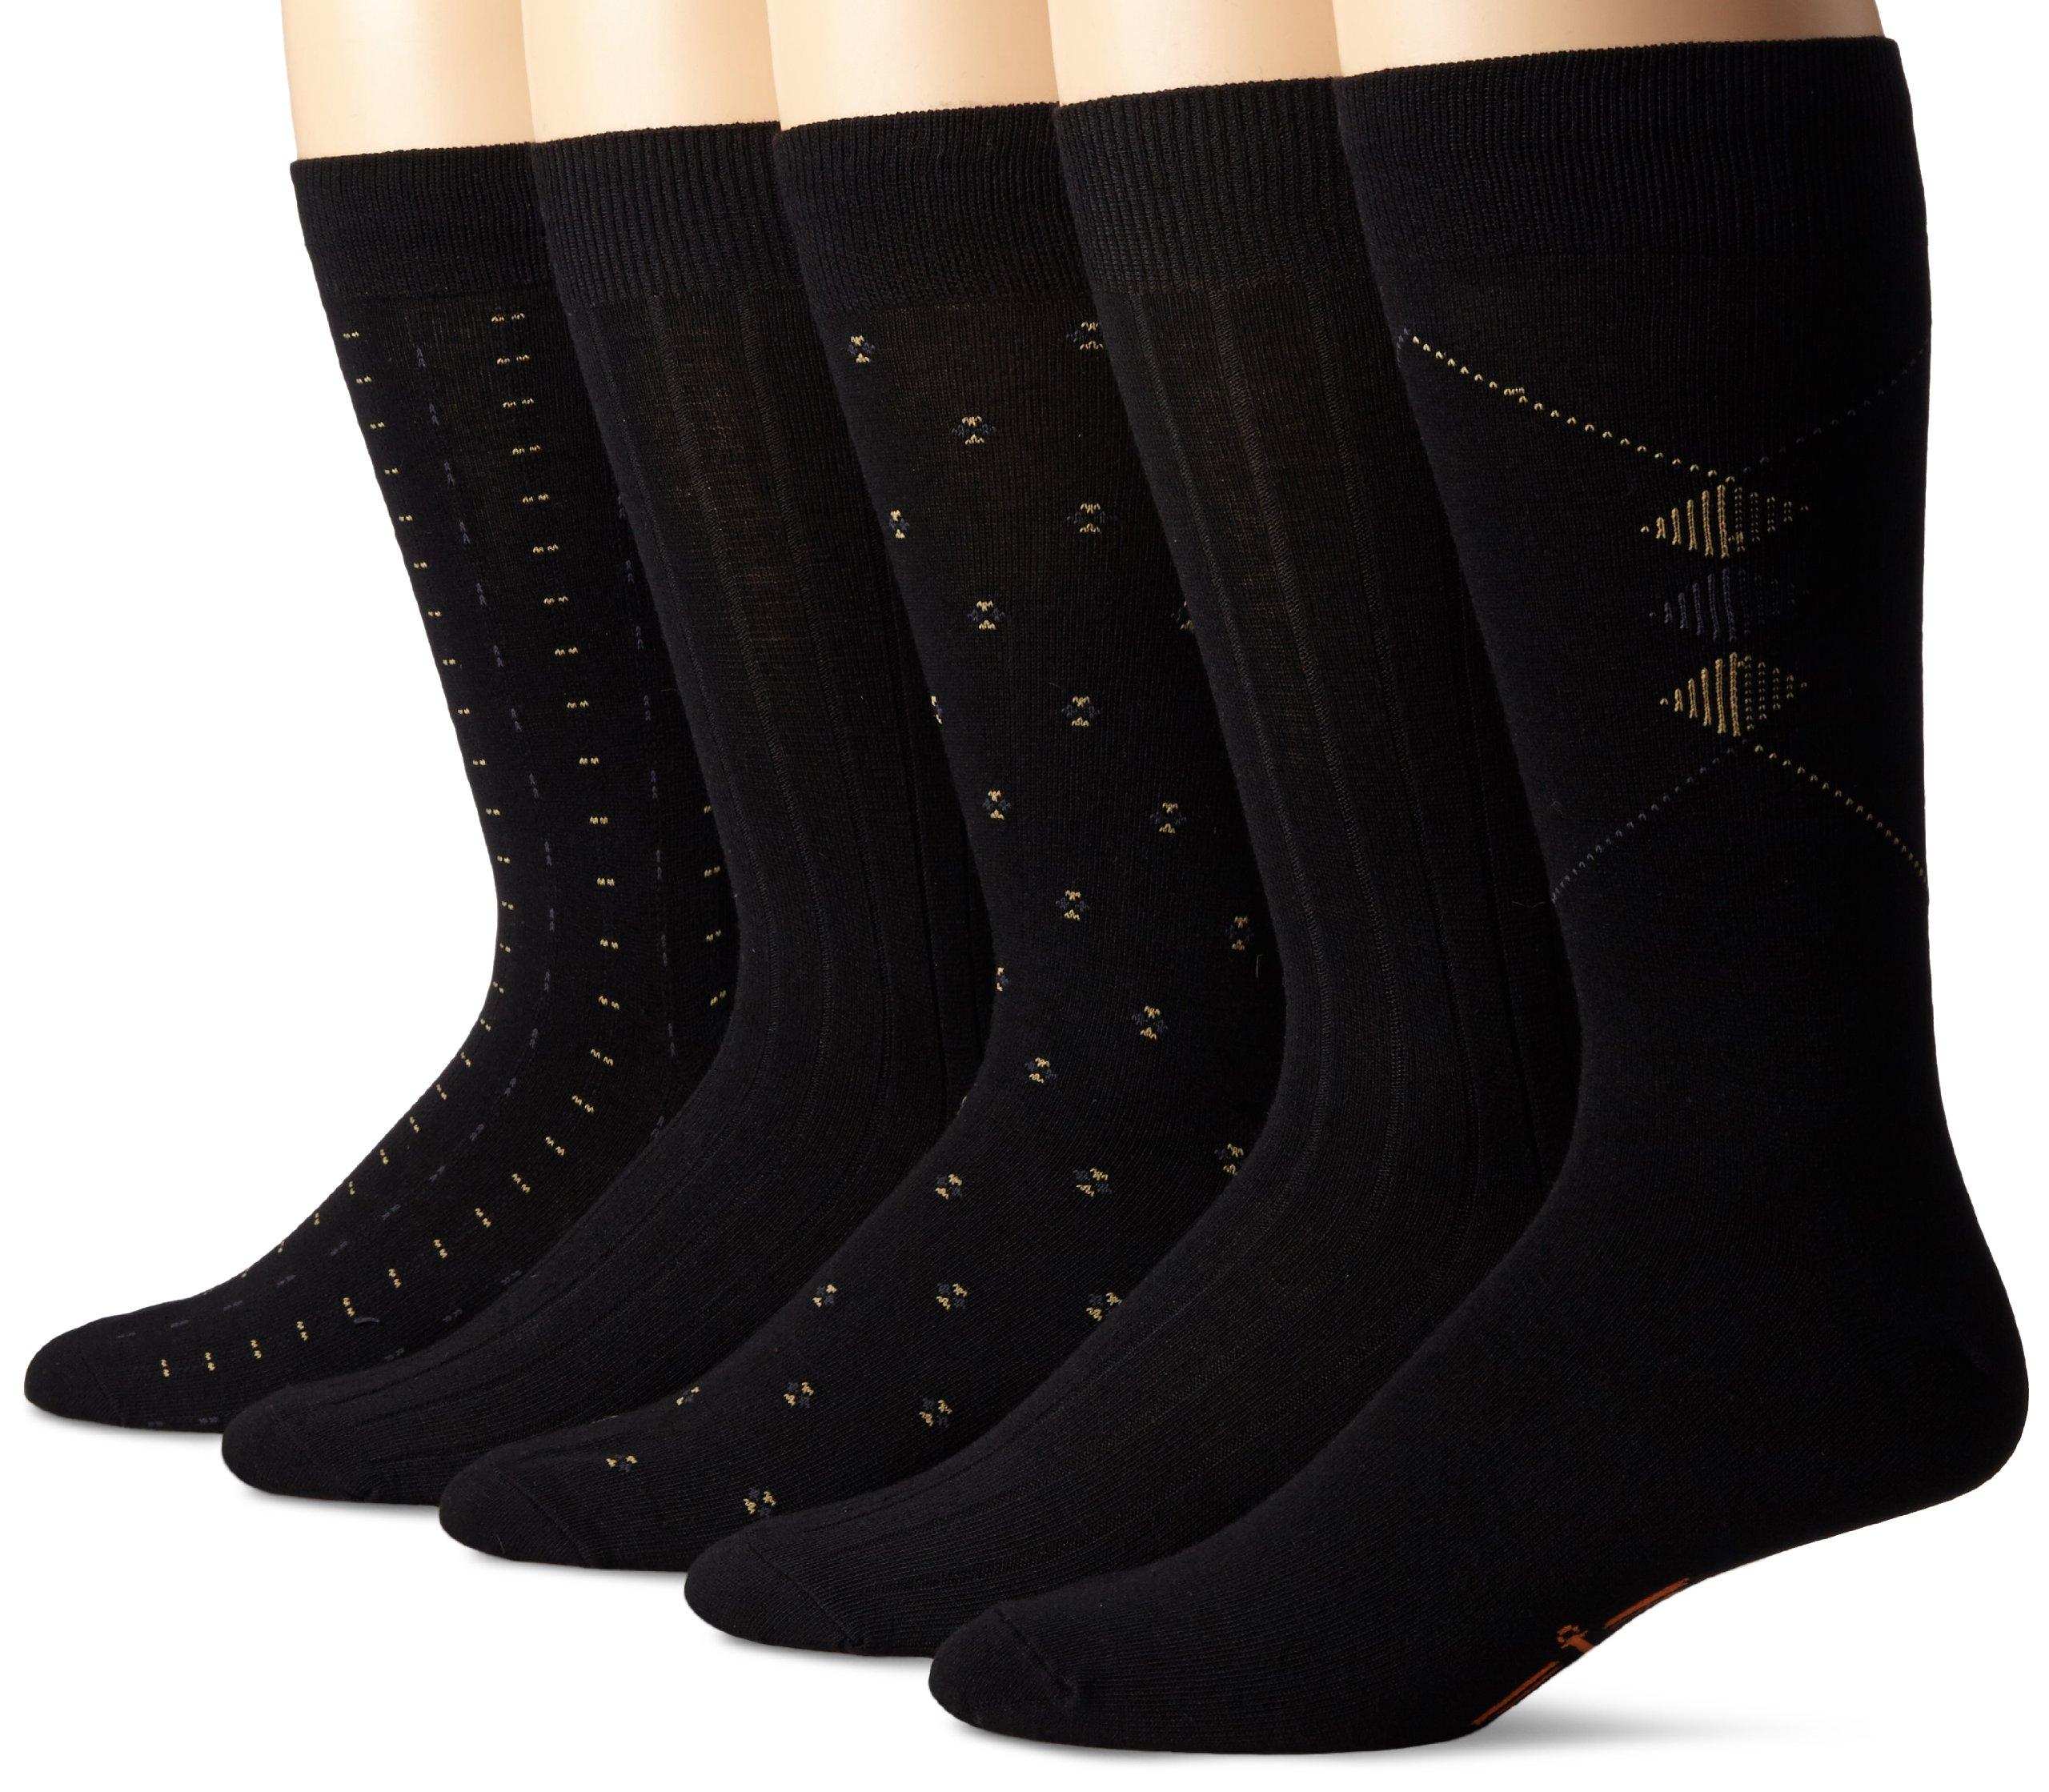 Dockers Men's 5 Pack Classics Dress Dobby Crew Socks, Black, Sock Size:10-13/Shoe Size: 6-12